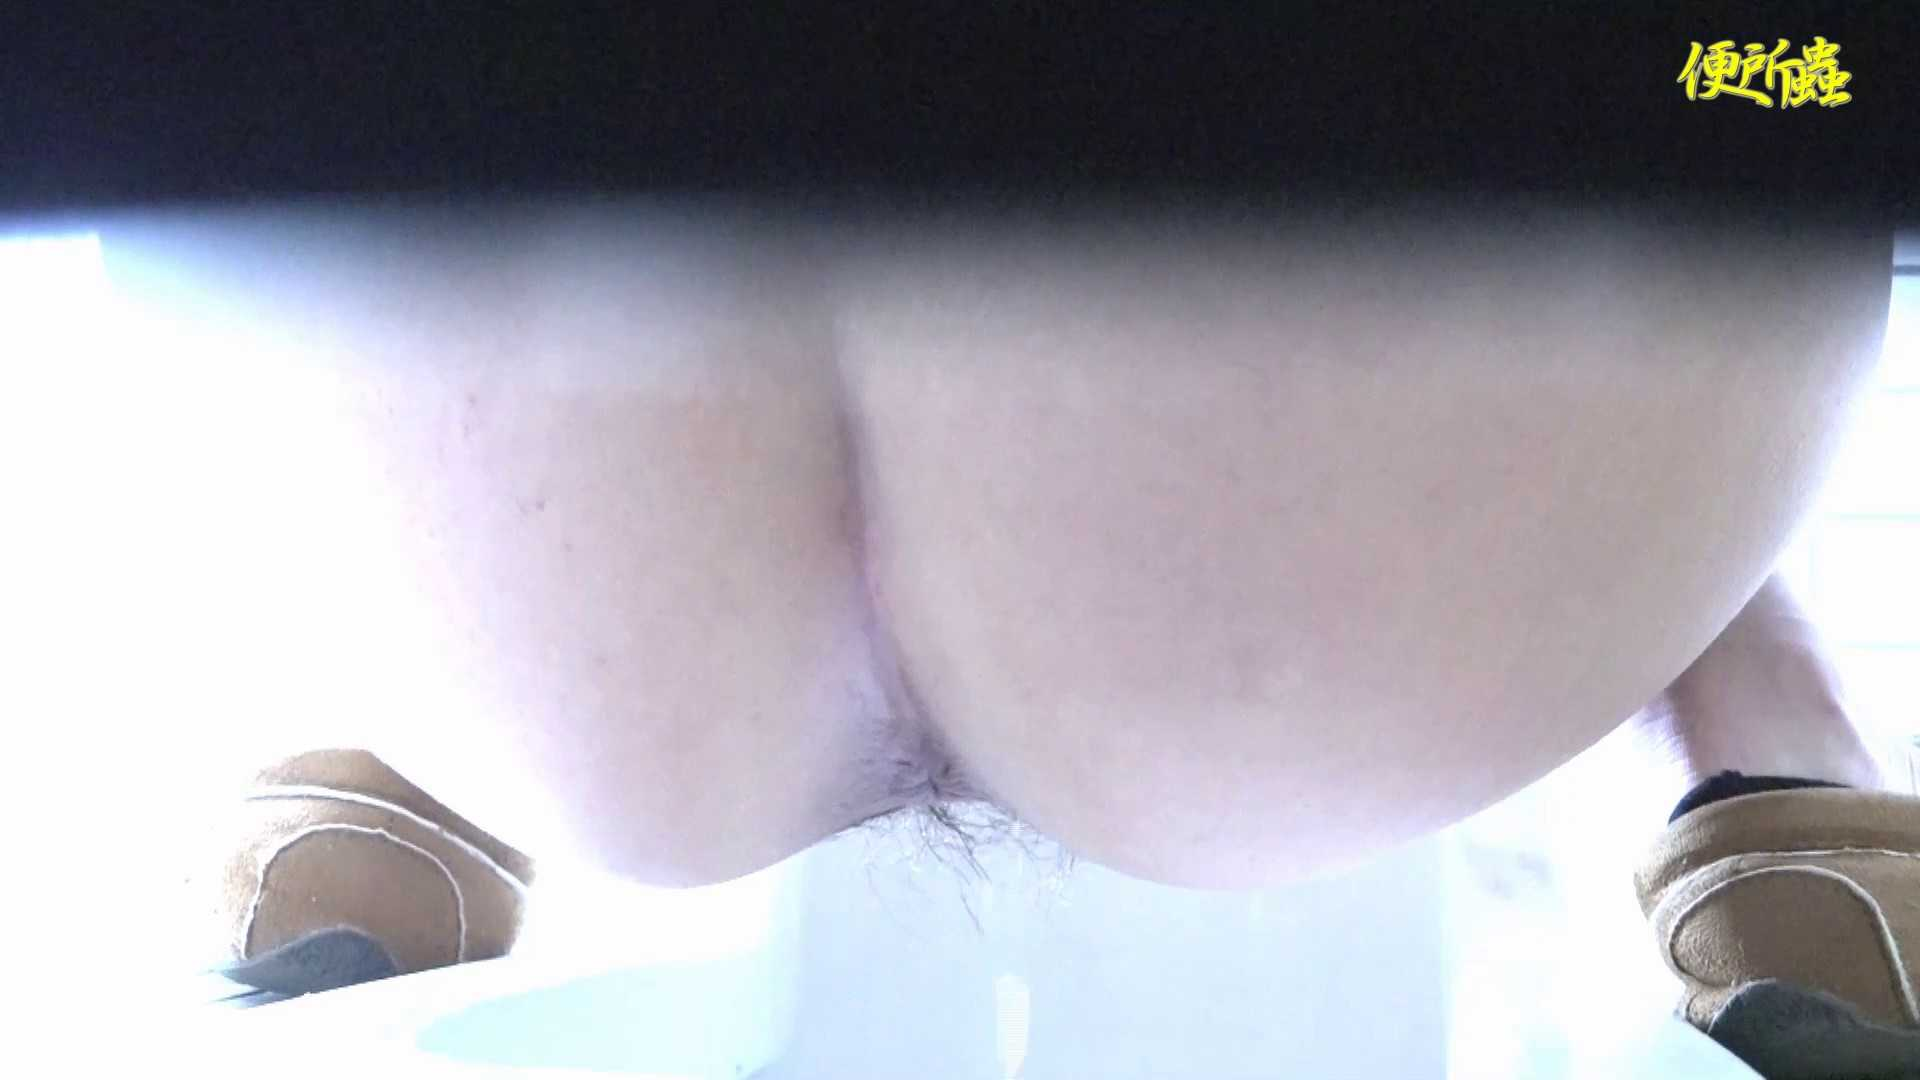 vol.01 便所蟲さんのリターン~便所蟲2匹目~ 盛合せ セックス無修正動画無料 106画像 53